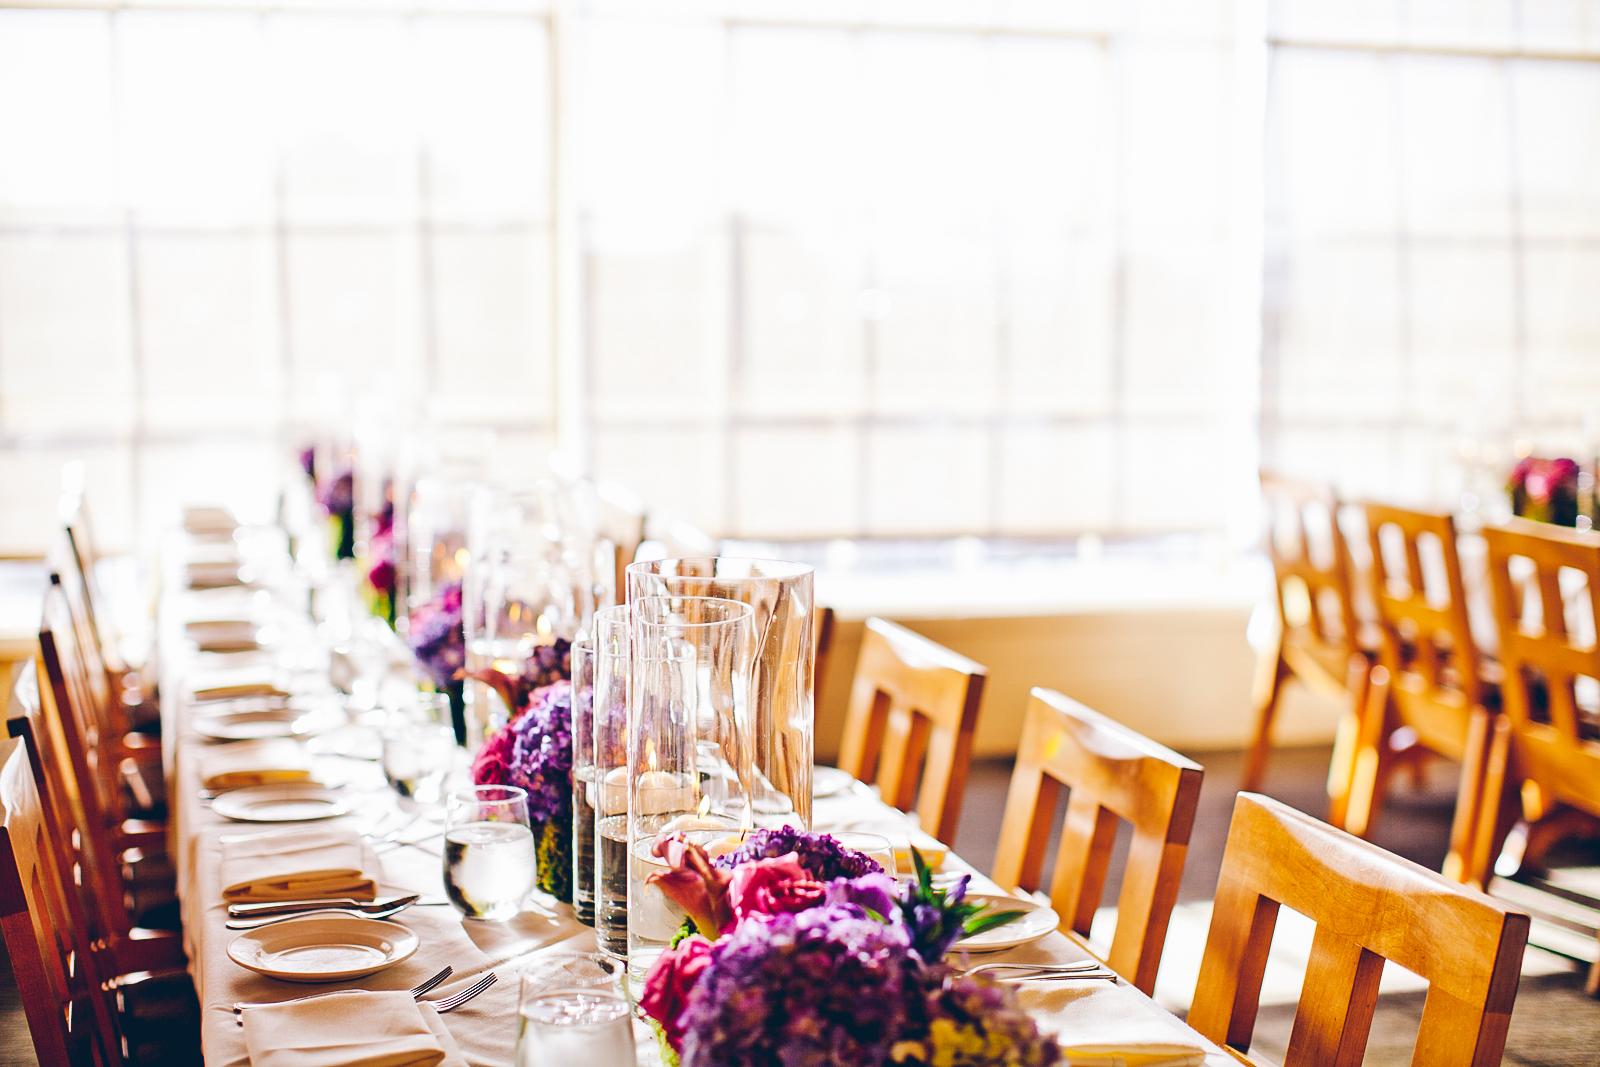 greens_restaurant_wedding_photography_san_franscisco_ebony_siovhan_bokeh_photography_32.jpg